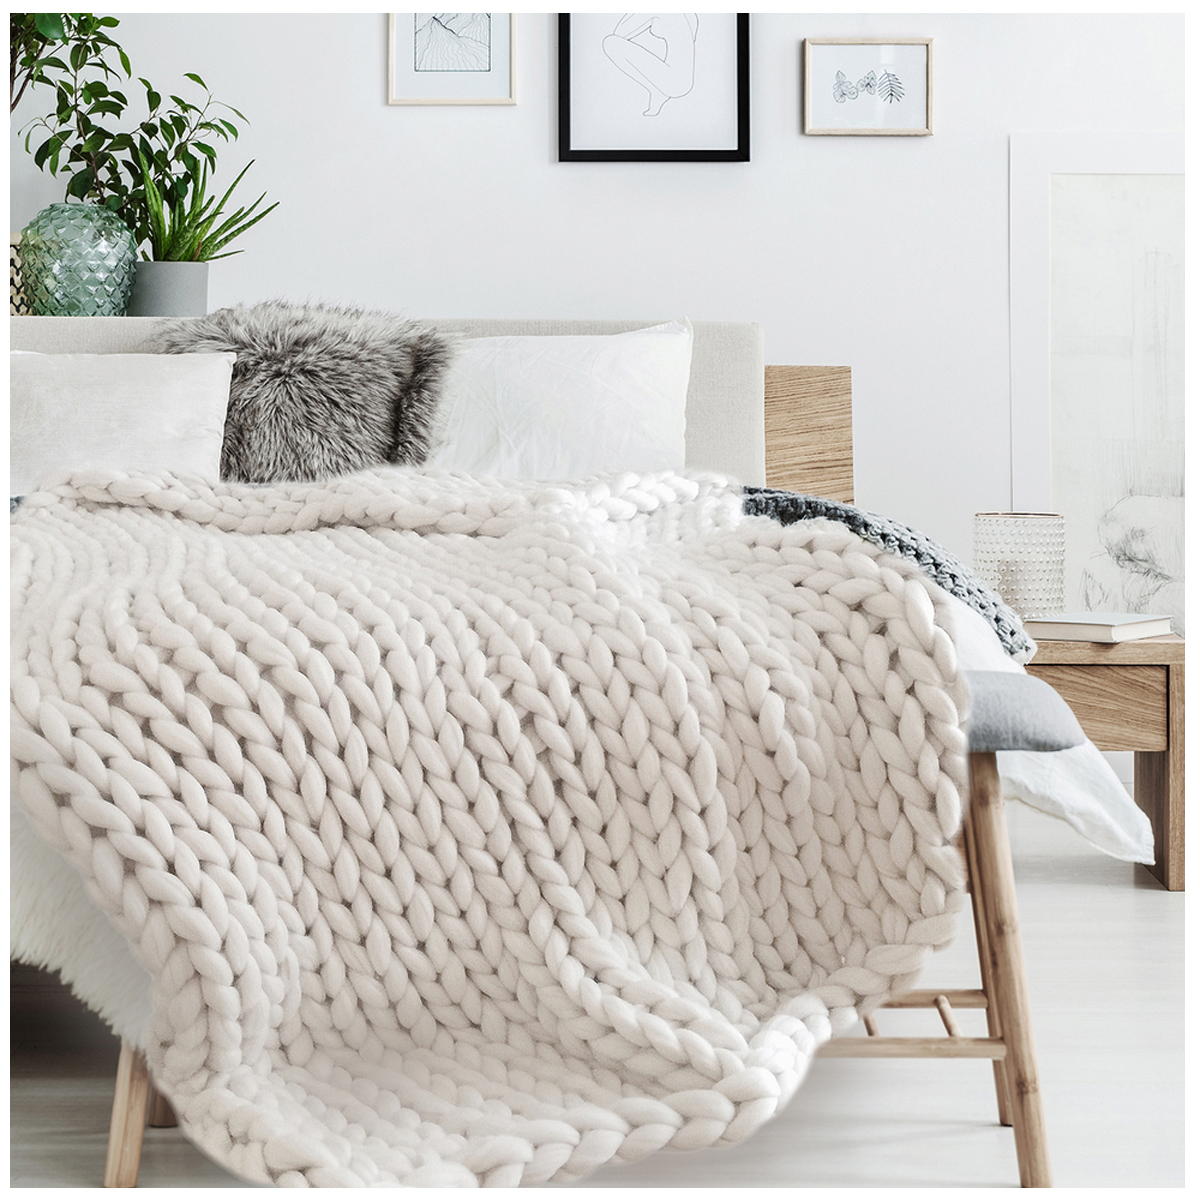 Plaid acrylique \'Chunky Knit\' écru (tricot) - 150x120 cm - [R0038]